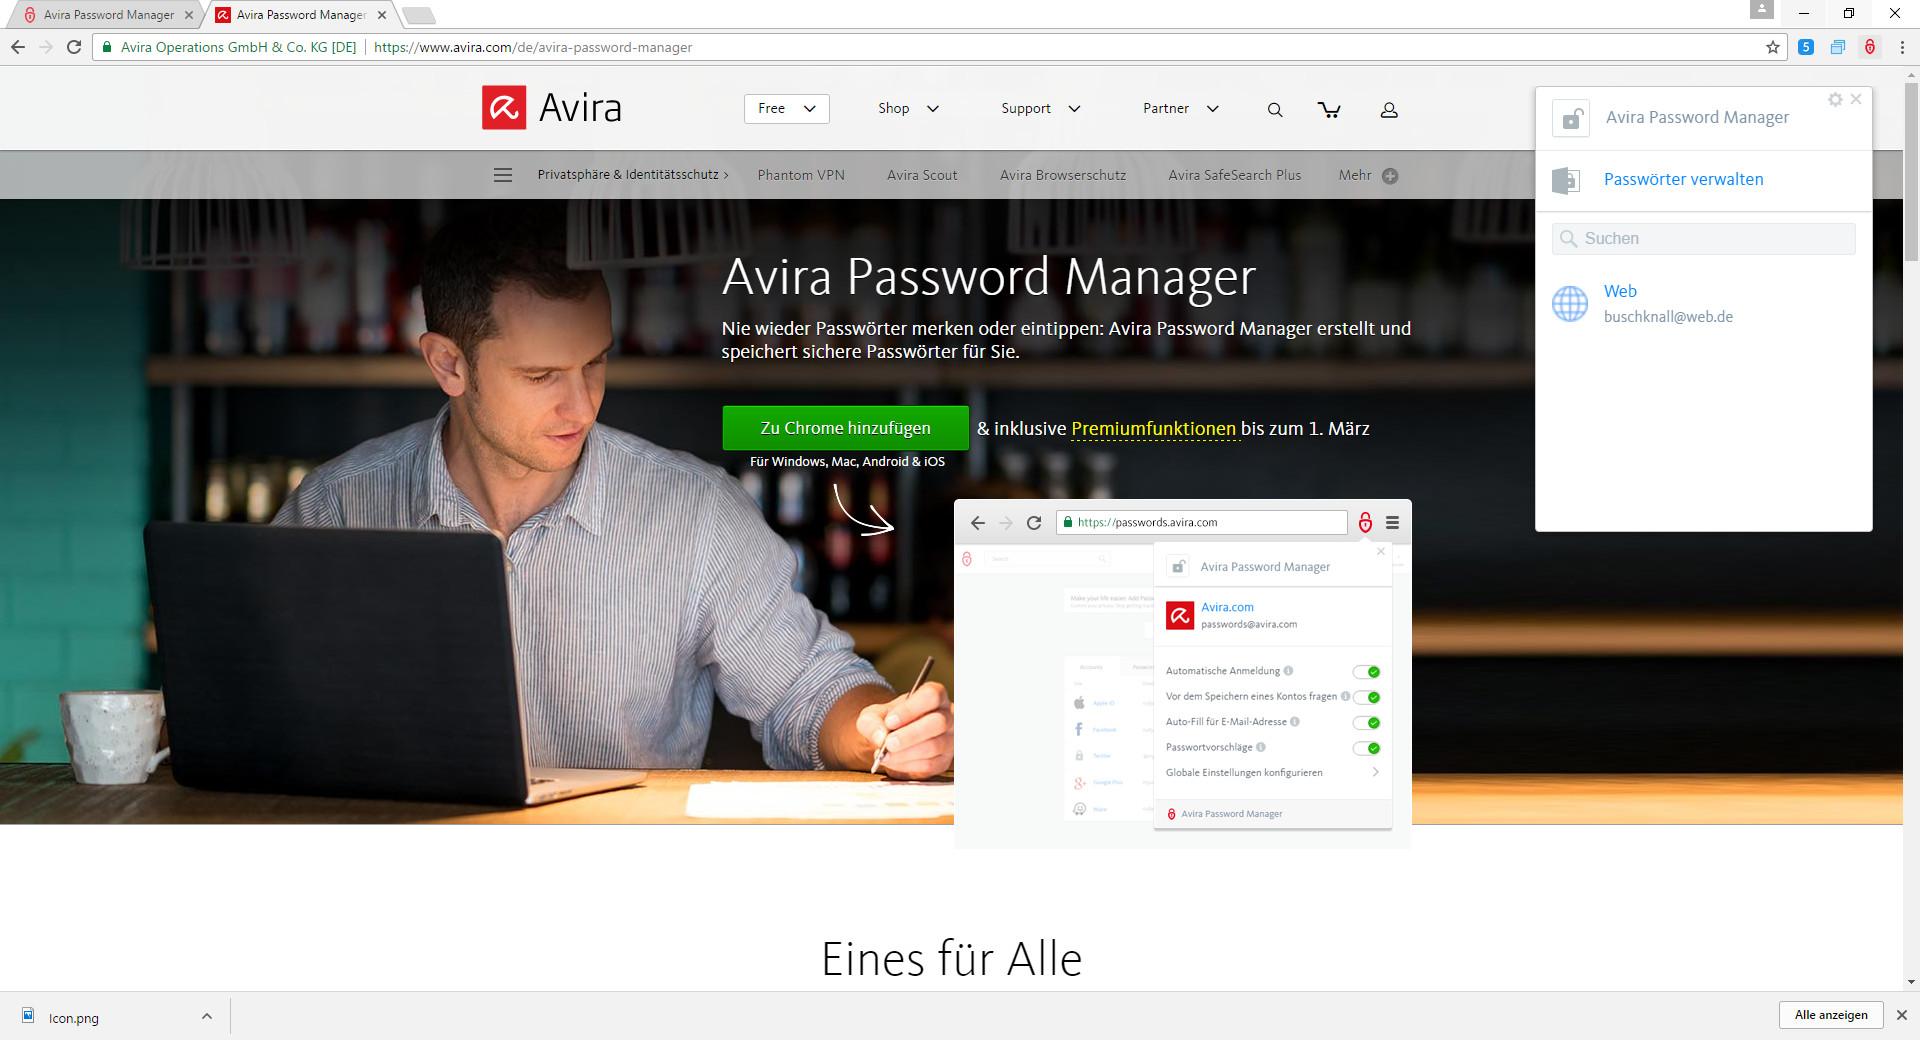 Screenshot 1 - Avira Password Manager für Chrome